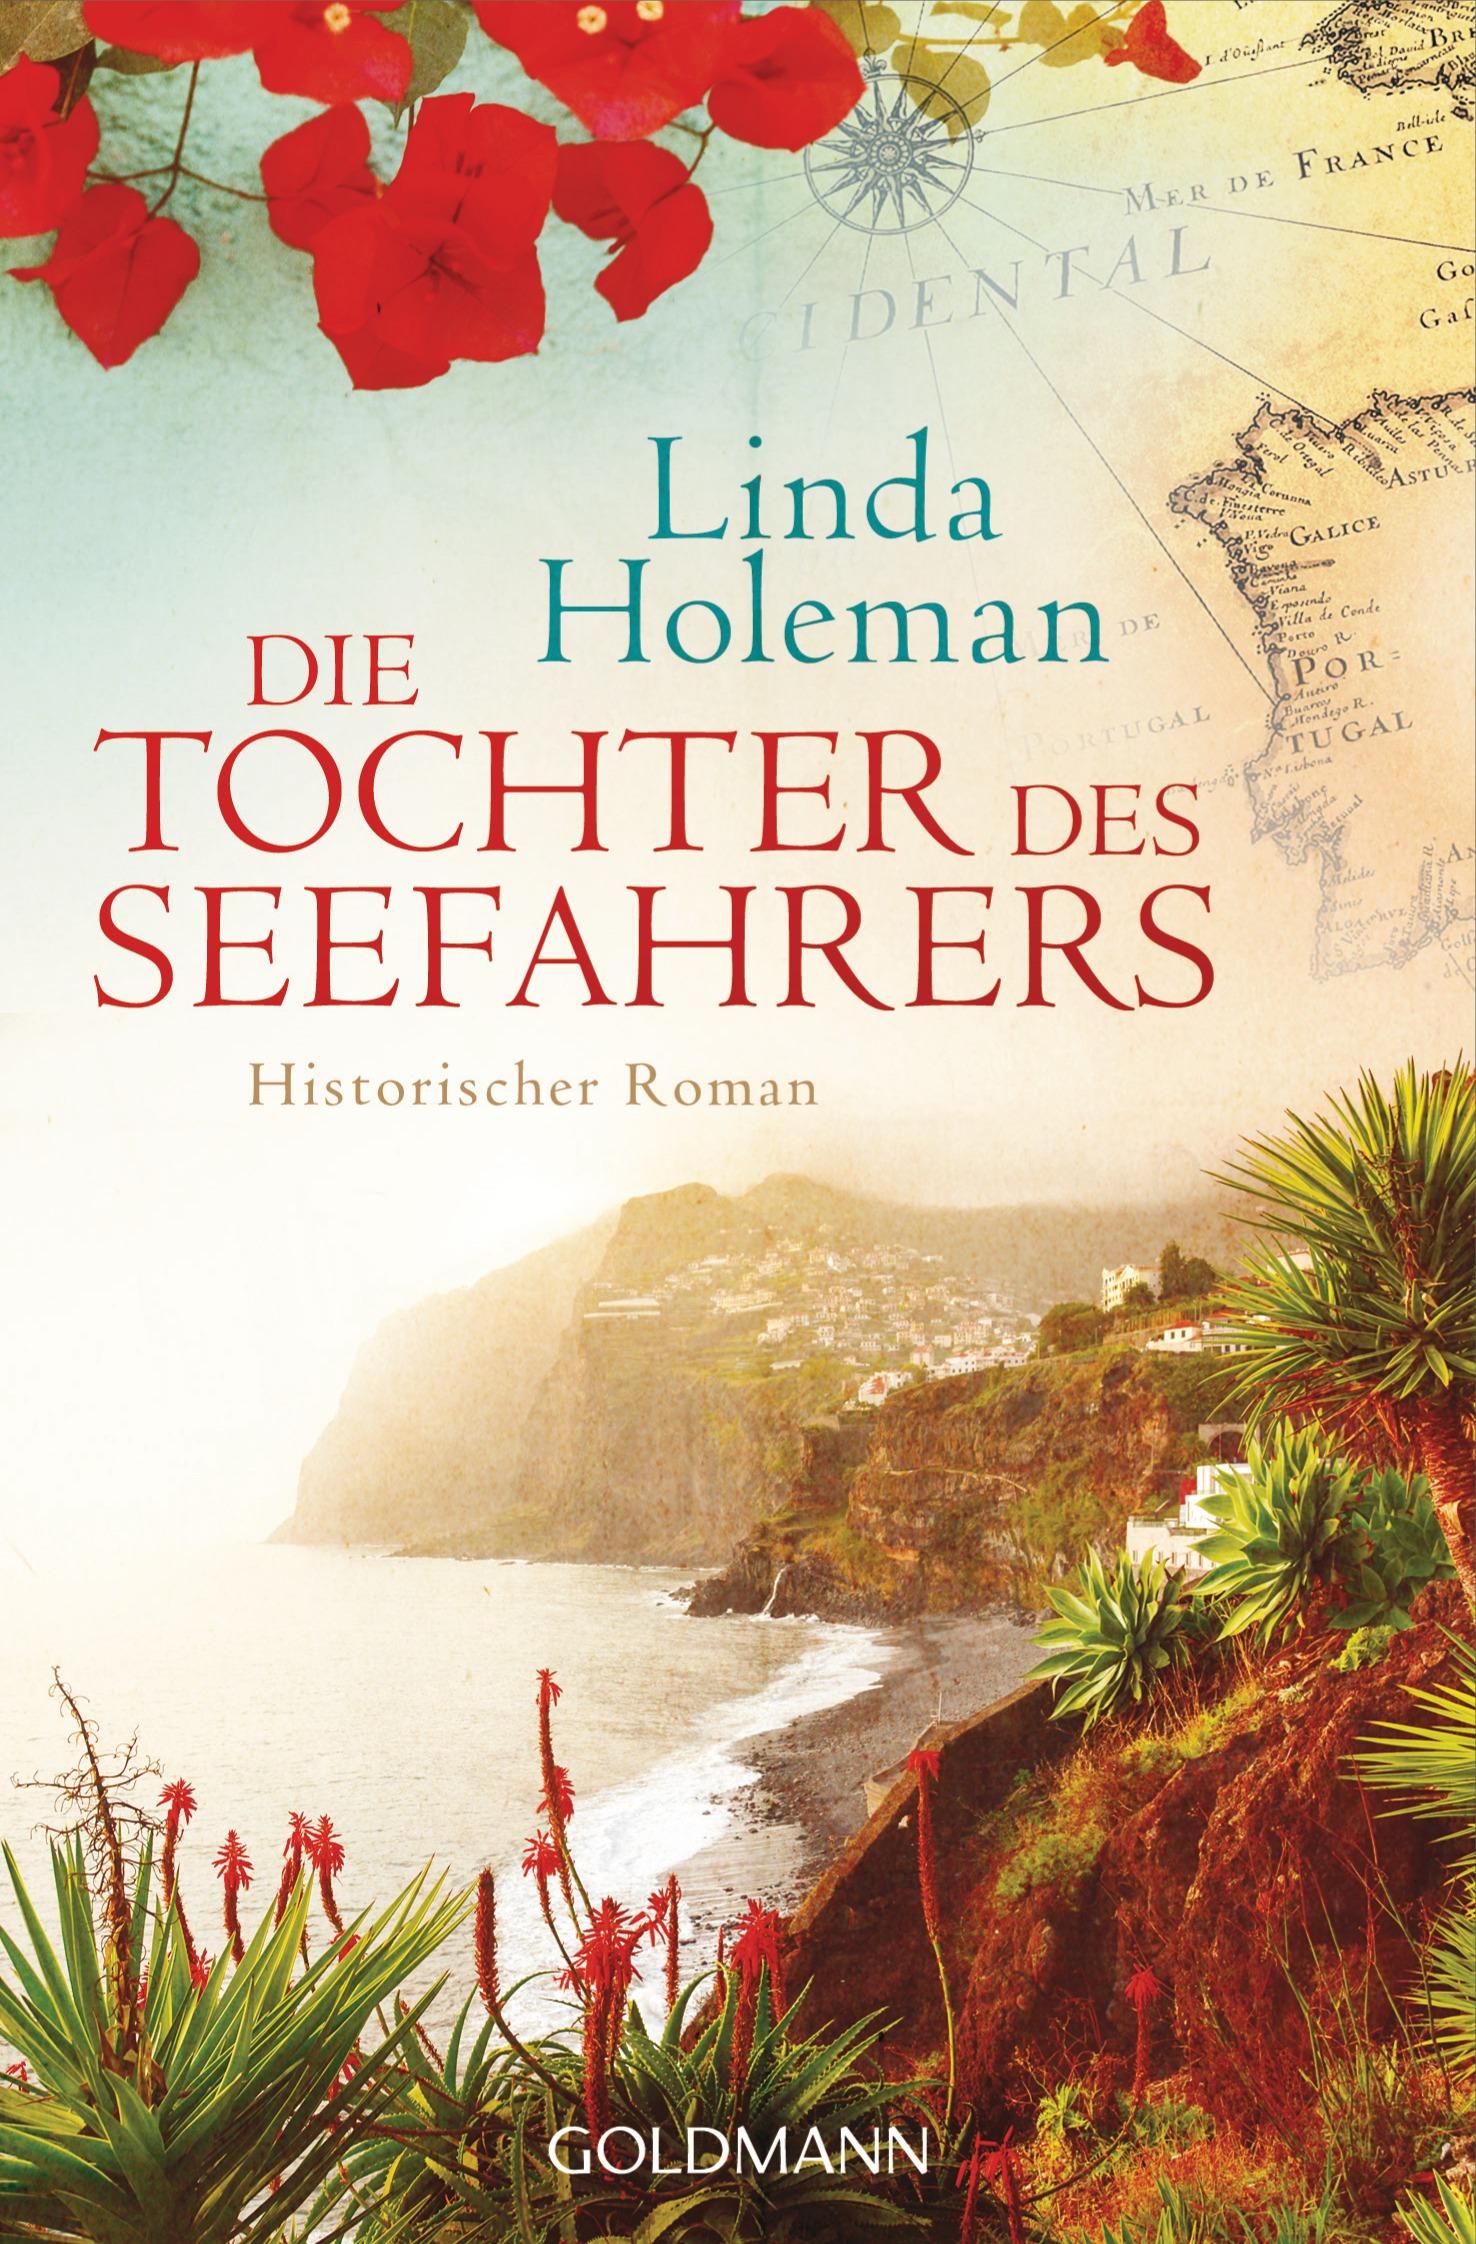 Die Tochter des Seefahrers - Linda Holeman